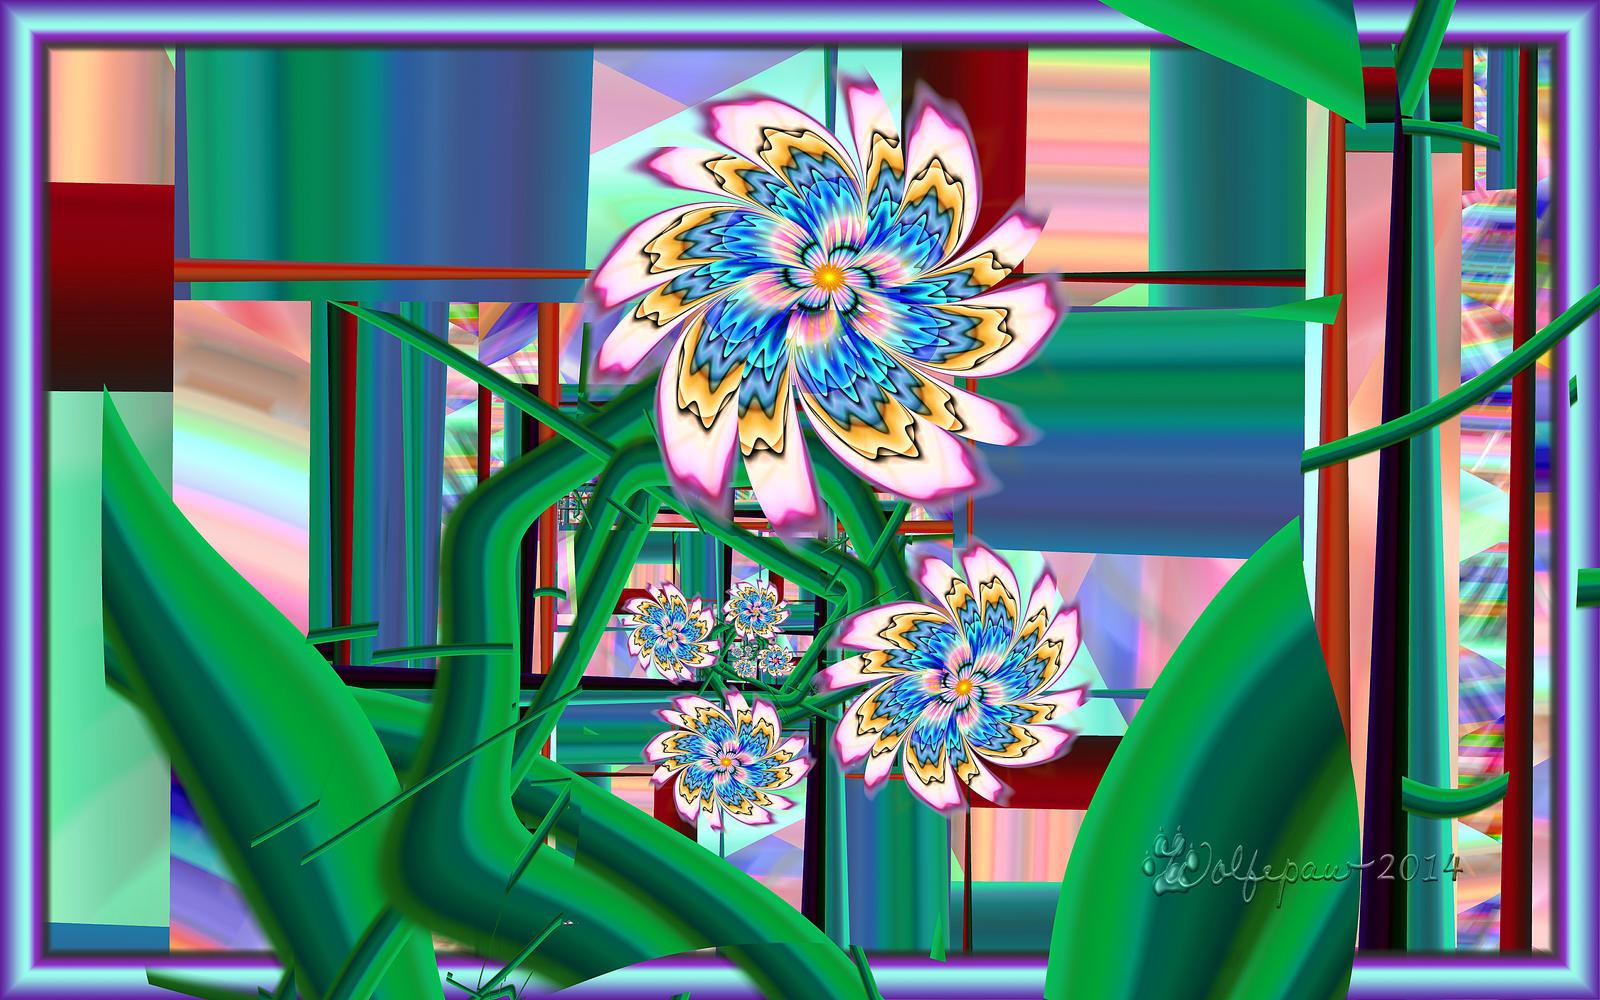 Barnsley Flowers By Wolfepaw On DeviantArt